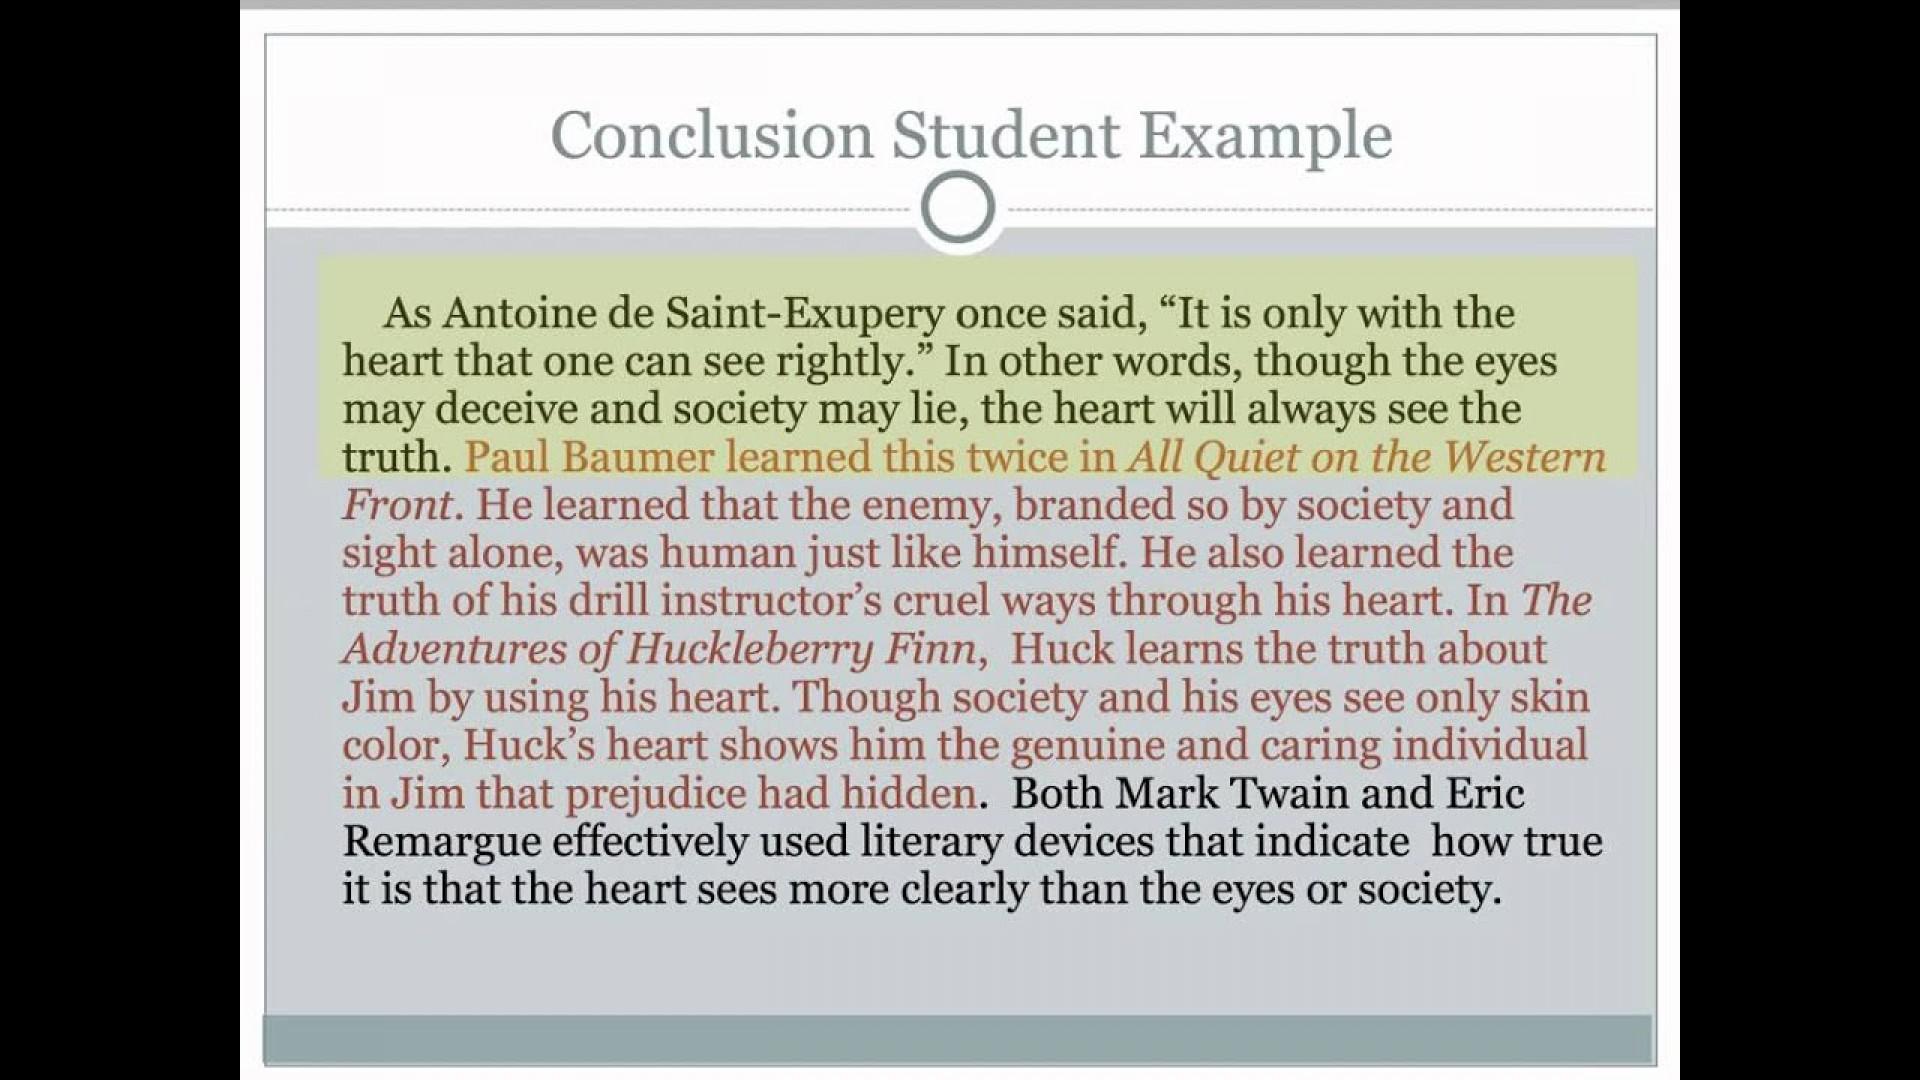 016 Essay Example Nurse Mentorship Great Mba Essays Plan For Writing Shocking Mentoring Contoh 1920